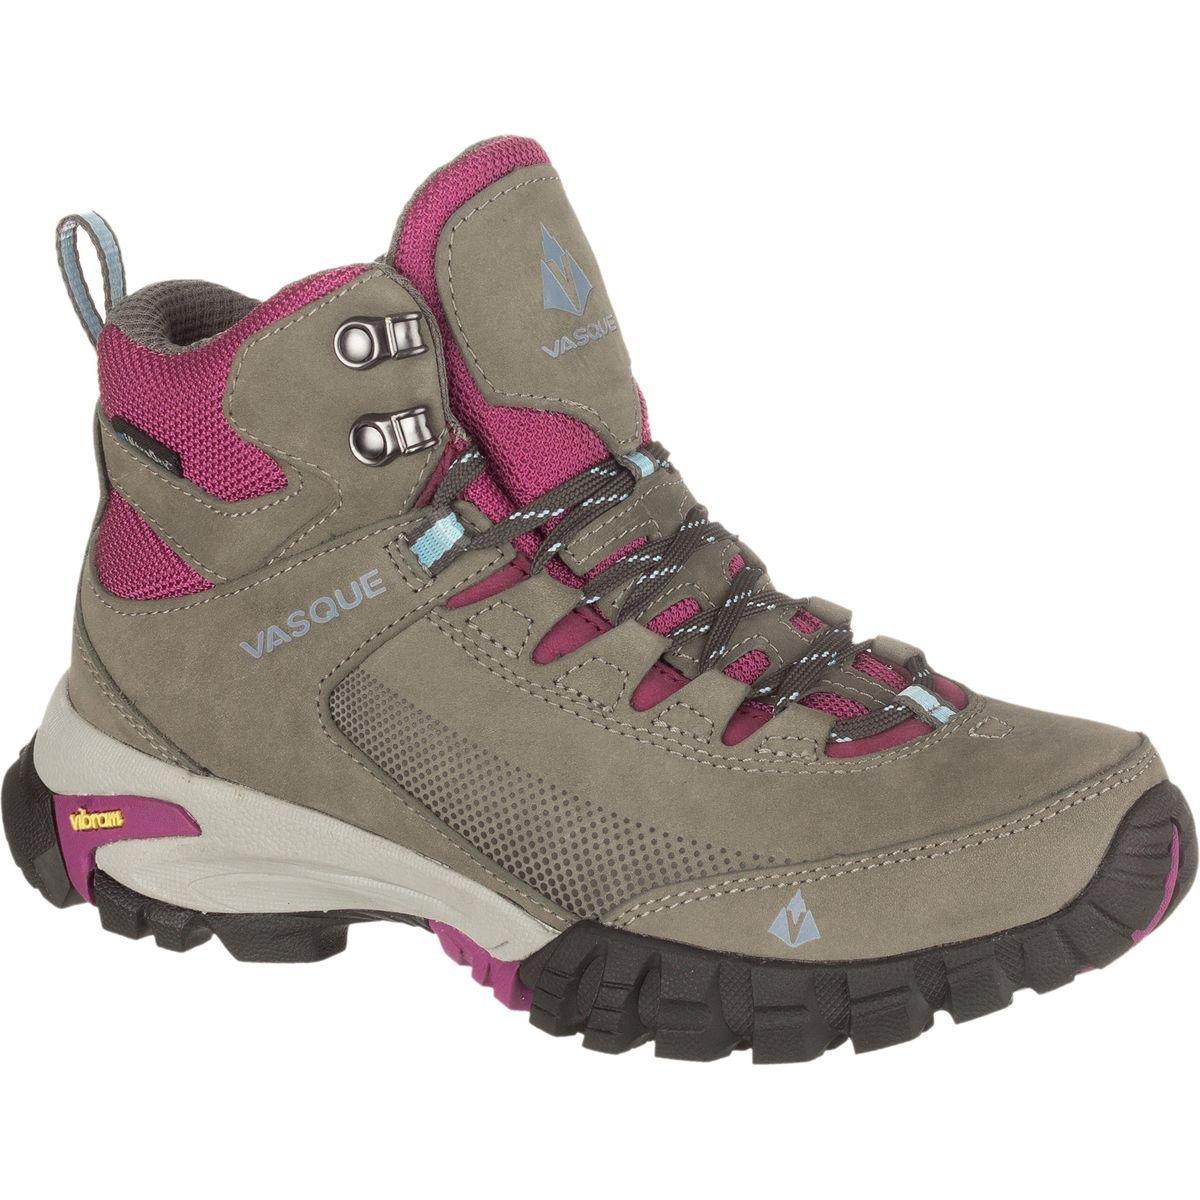 Vasque Women's Talus Trek UltraDry Hiking Boot, Gargoyle/Damson, 11 M US by Vasque